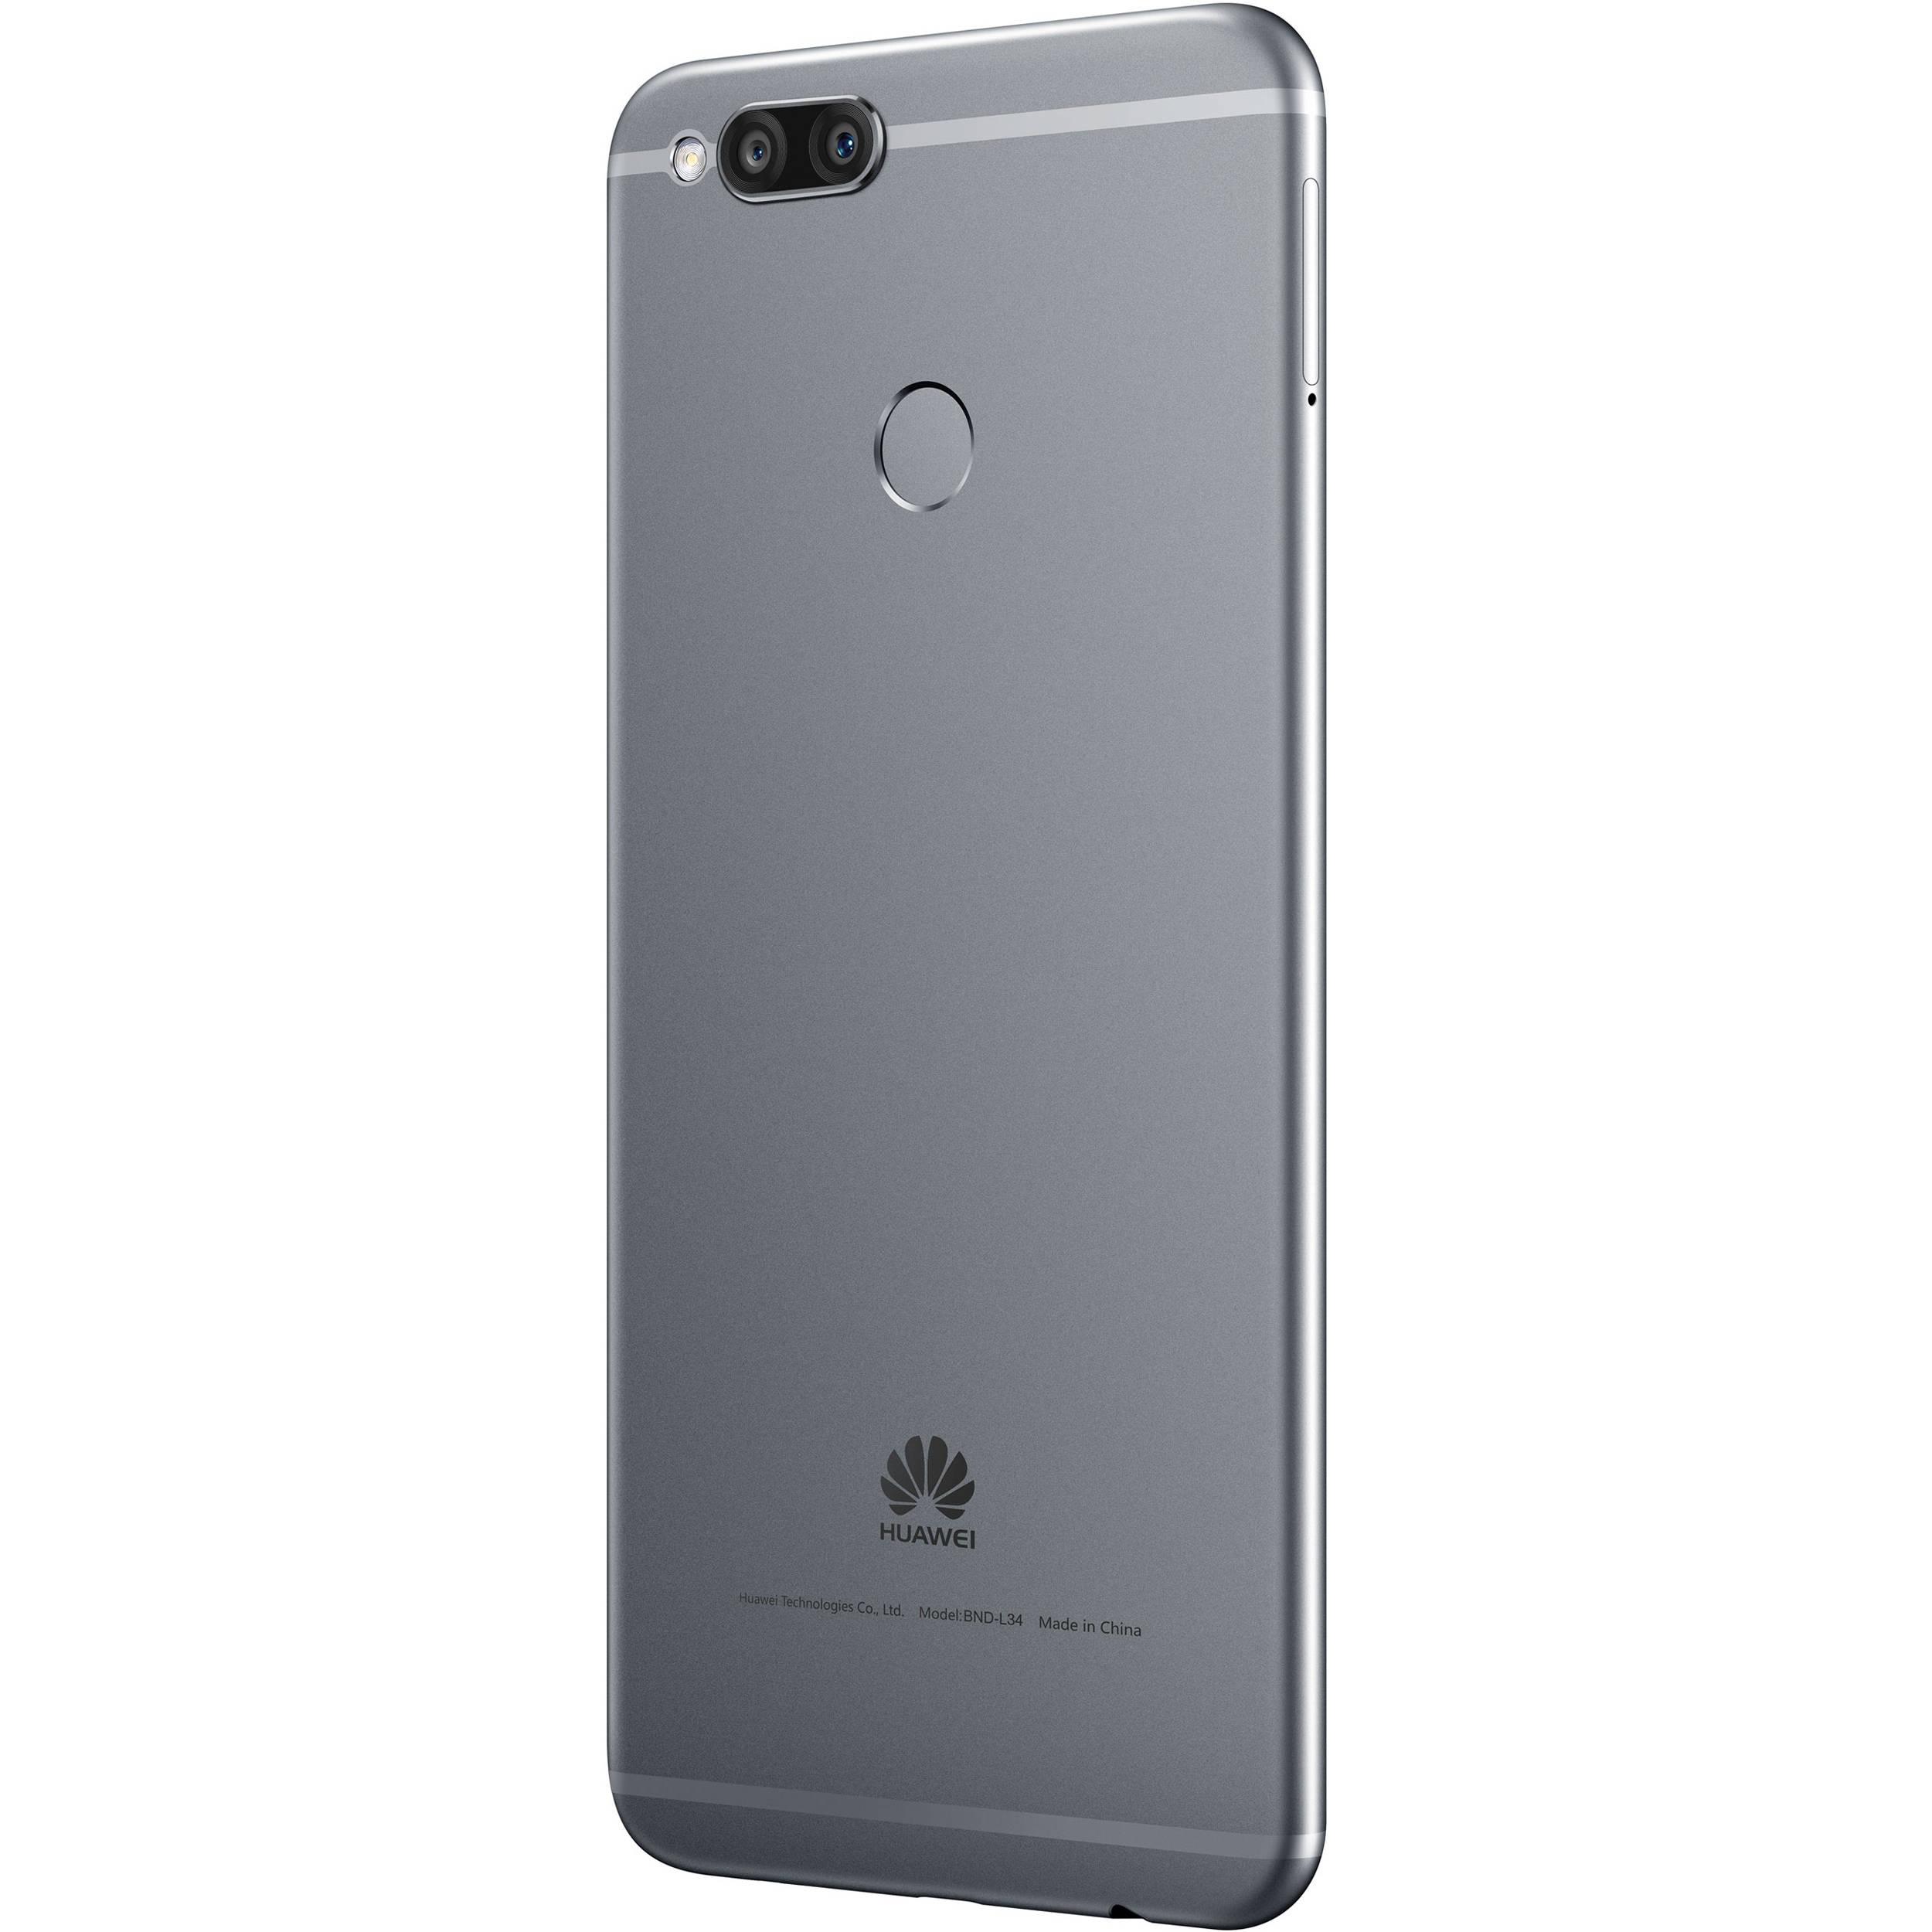 Huawei Mate SE 64GB Smartphone (Unlocked, Gray)